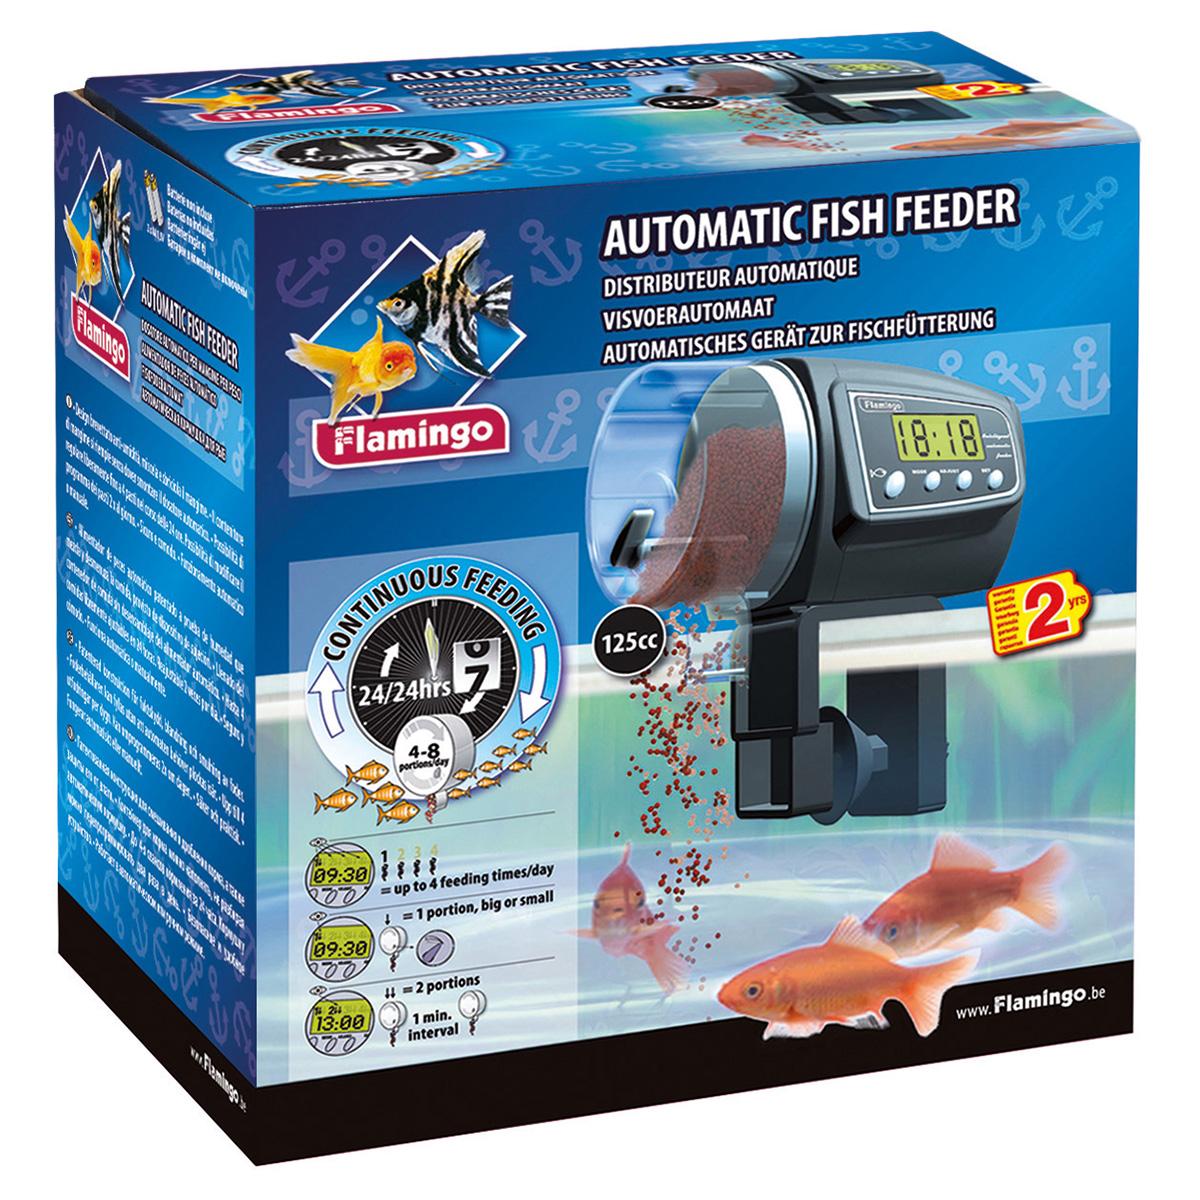 tsss automatische fischfutterautomat fisch futterautomat futterspender futter verteiler spender. Black Bedroom Furniture Sets. Home Design Ideas